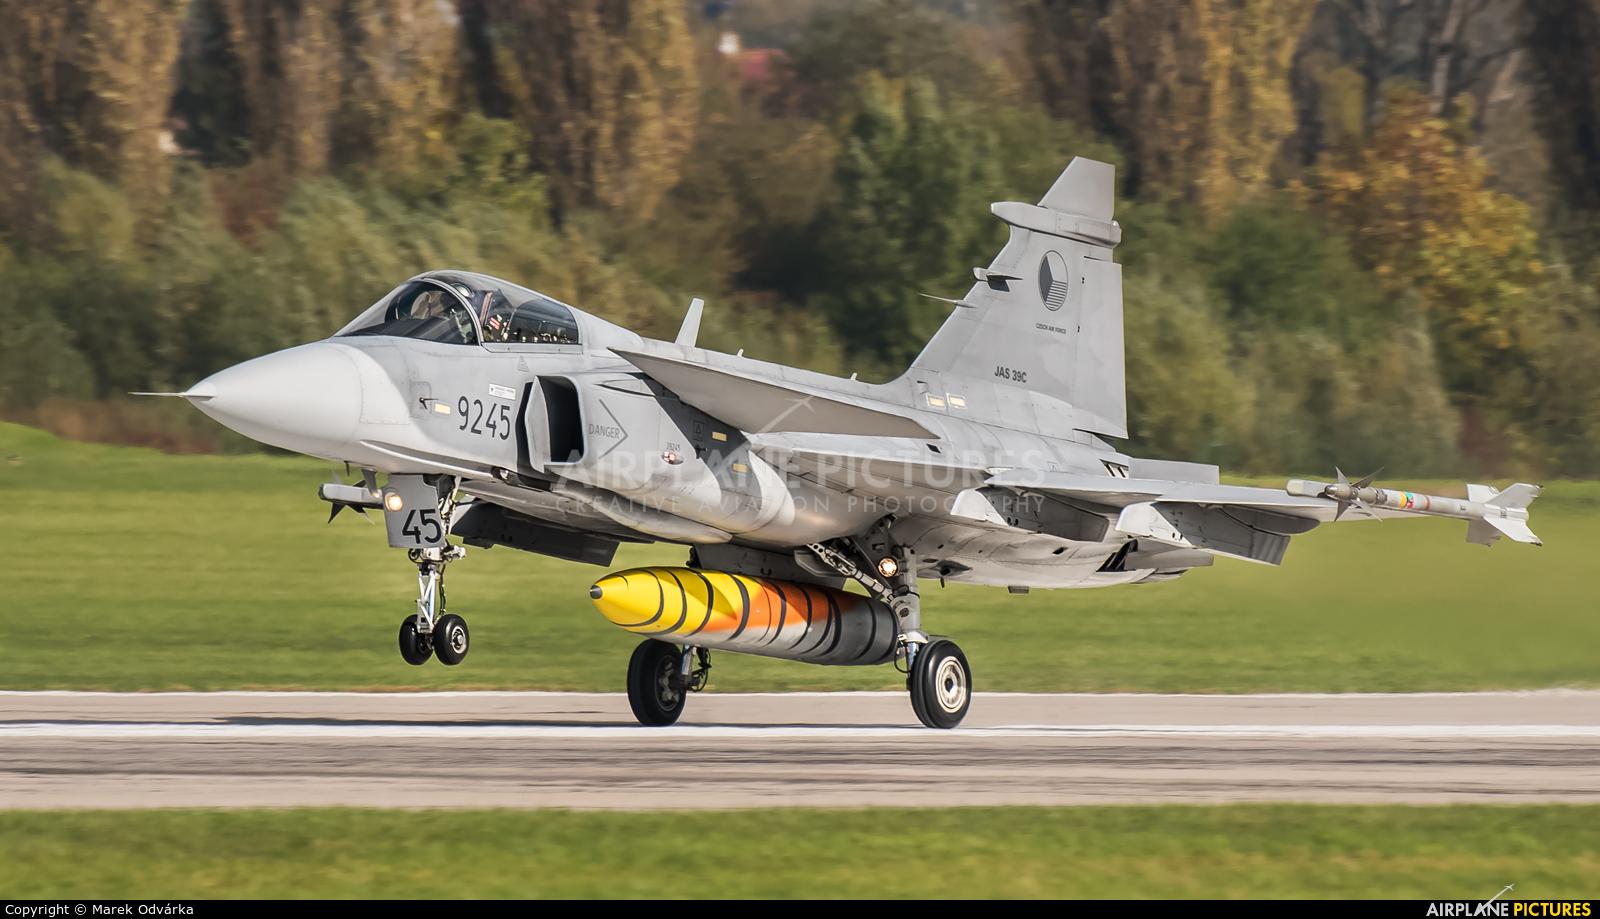 Czech - Air Force 9245 aircraft at Pardubice